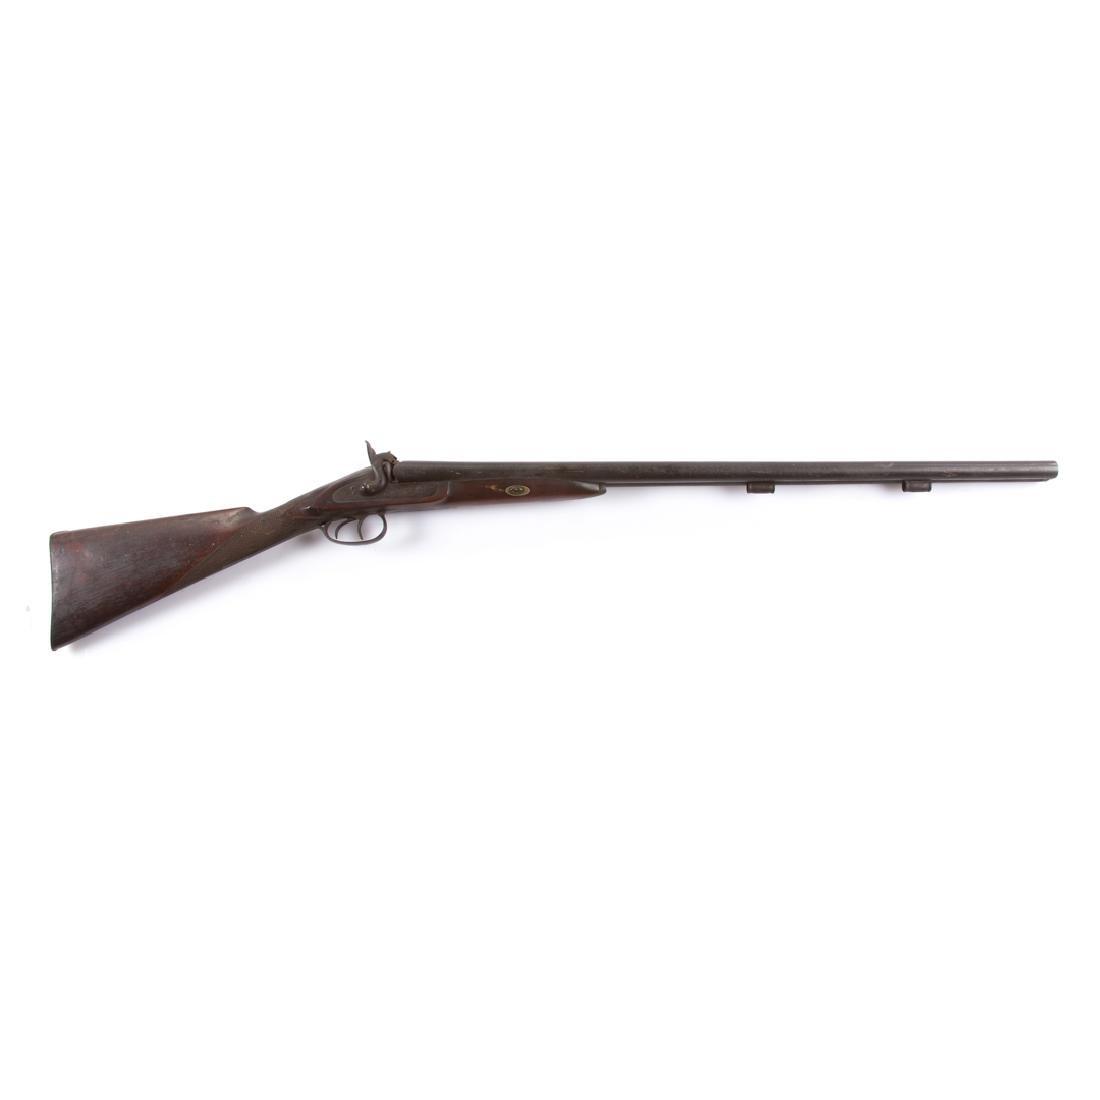 Manton shotgun